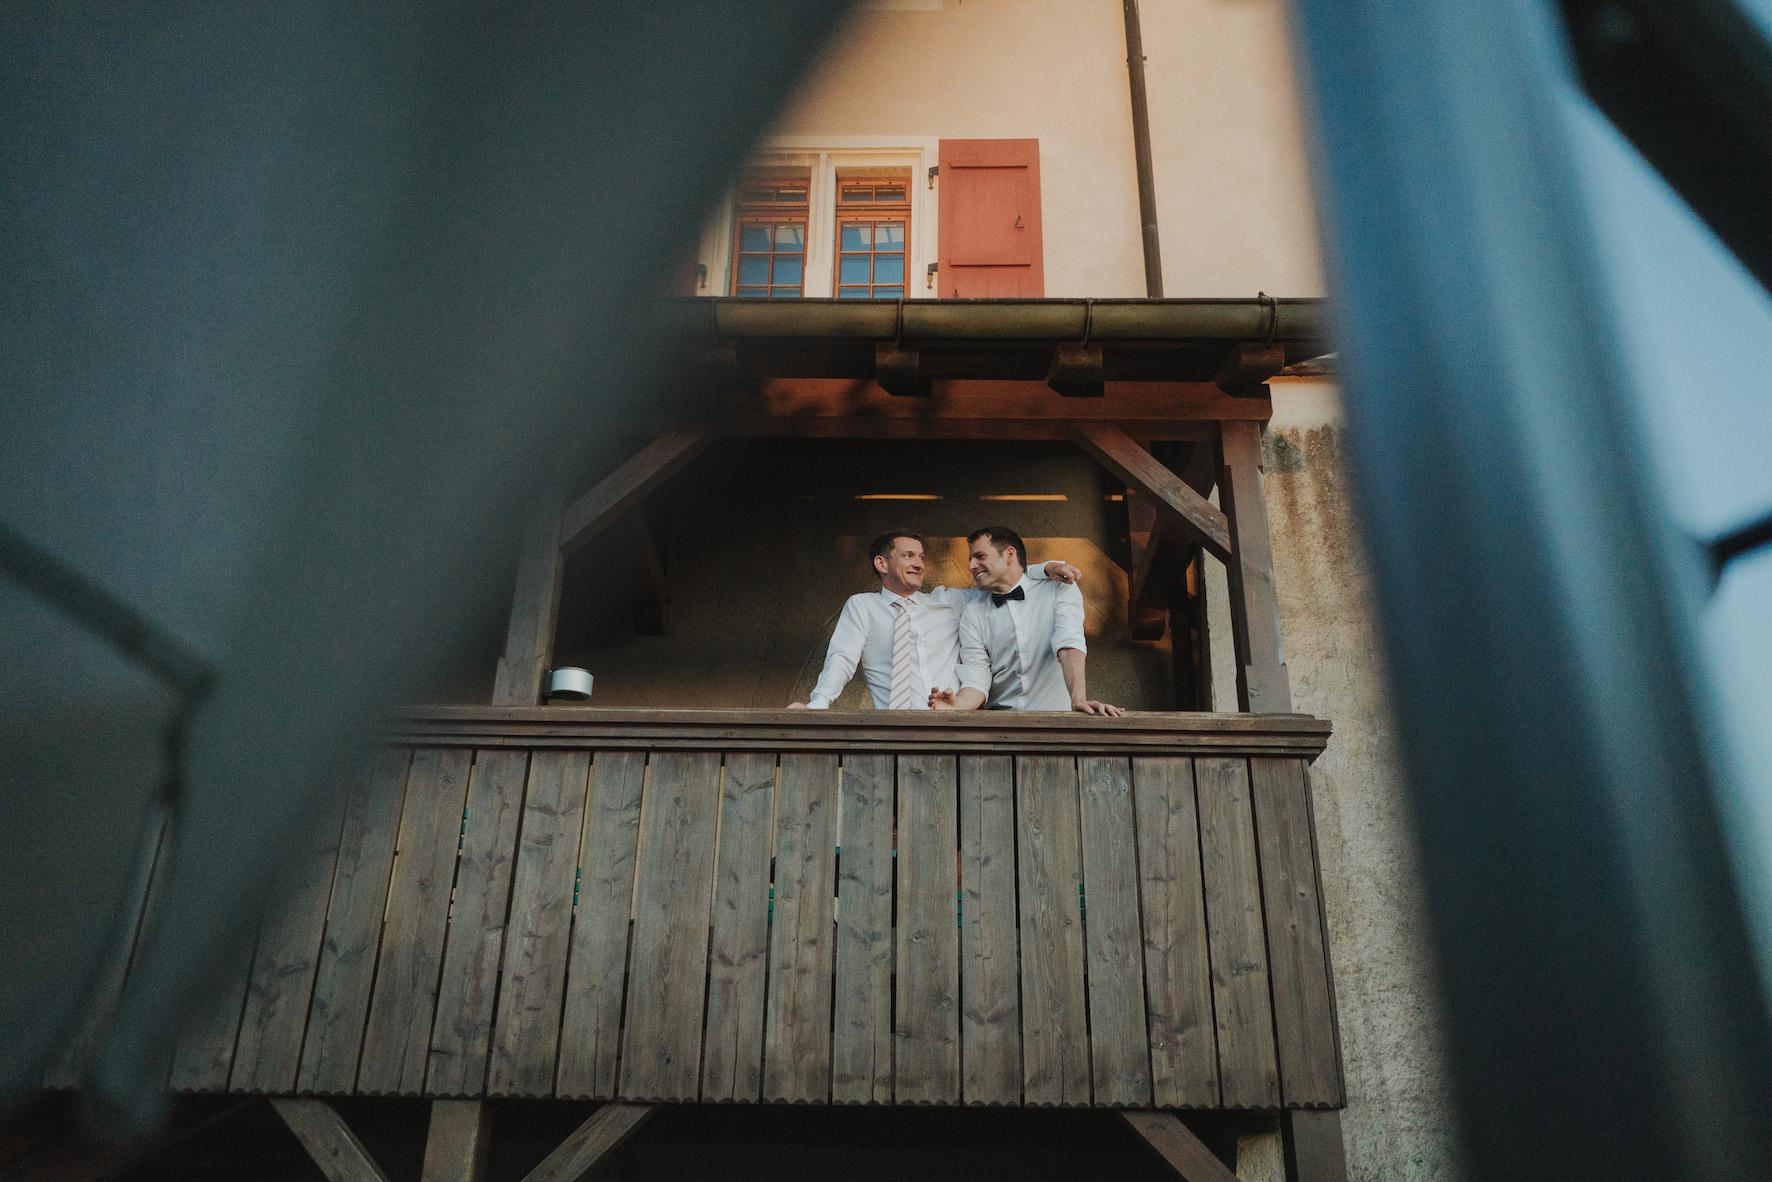 201807270306JC_wedding-0556320180824-Kopie.jpg